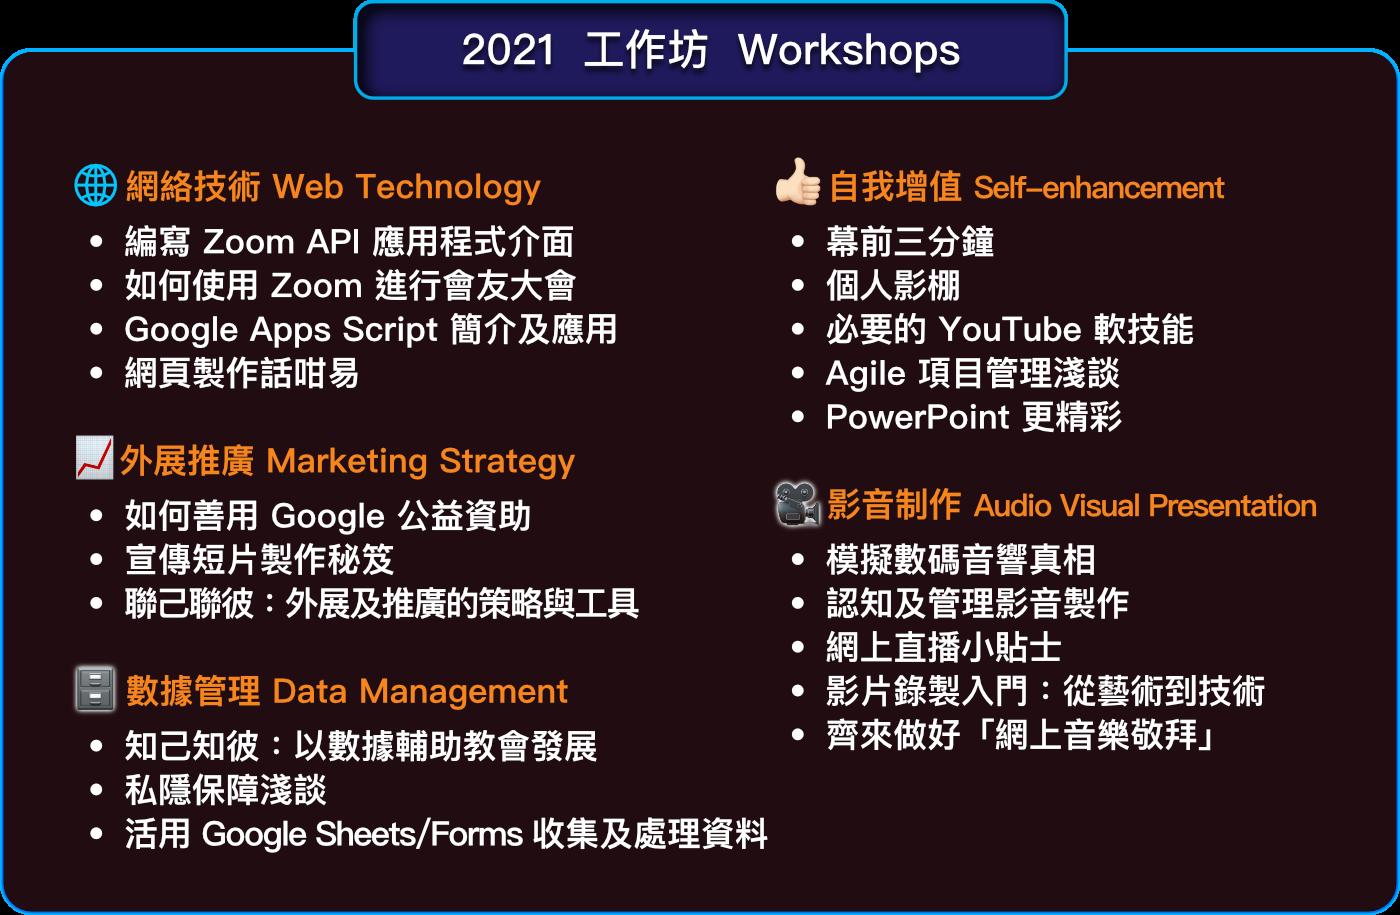 TECH2021-Workshops.png